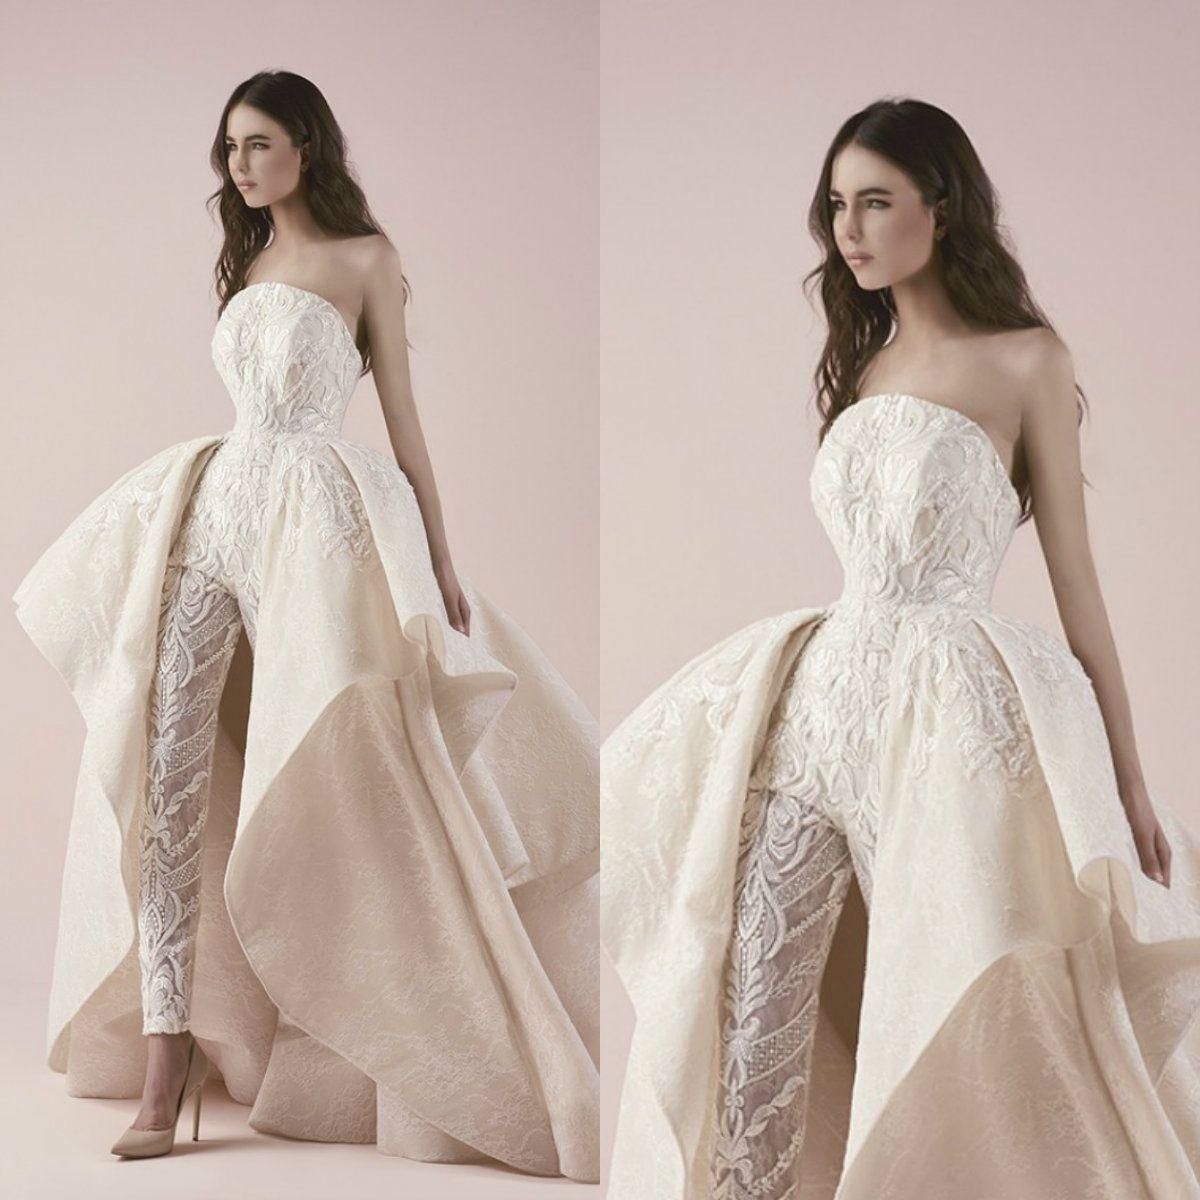 Cheap Wedding Dresses Under 500 Dollars: Discount Saiid Kobeisy 2019 Wedding Dresses Strapless